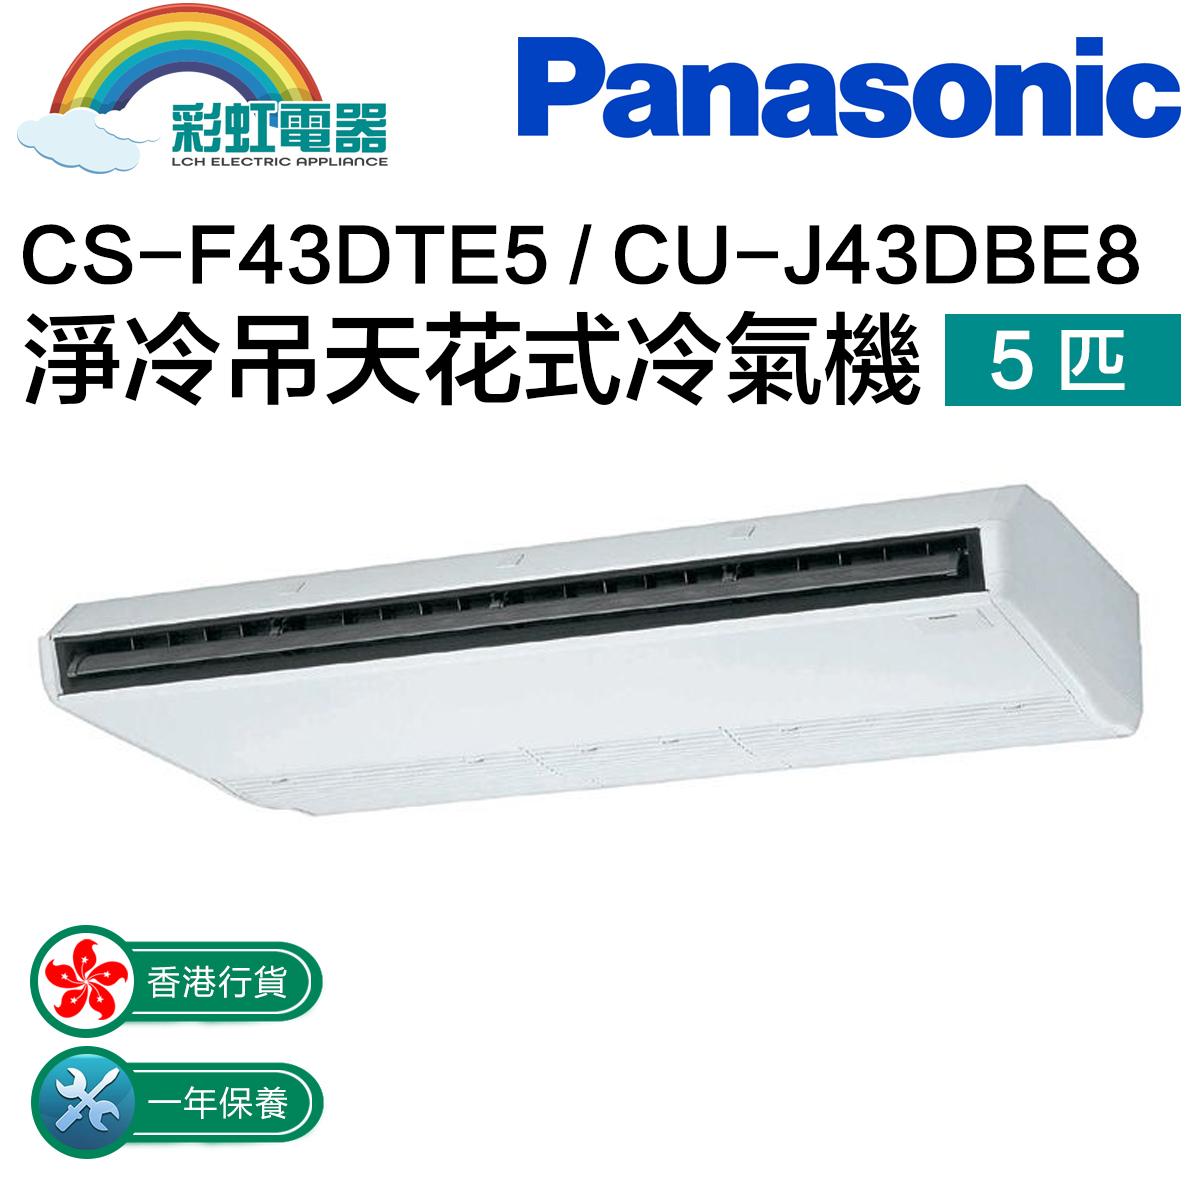 CS-F43DTE5 / CU-J43DBE8 Net cold ceiling fancy air conditioner 5 horse